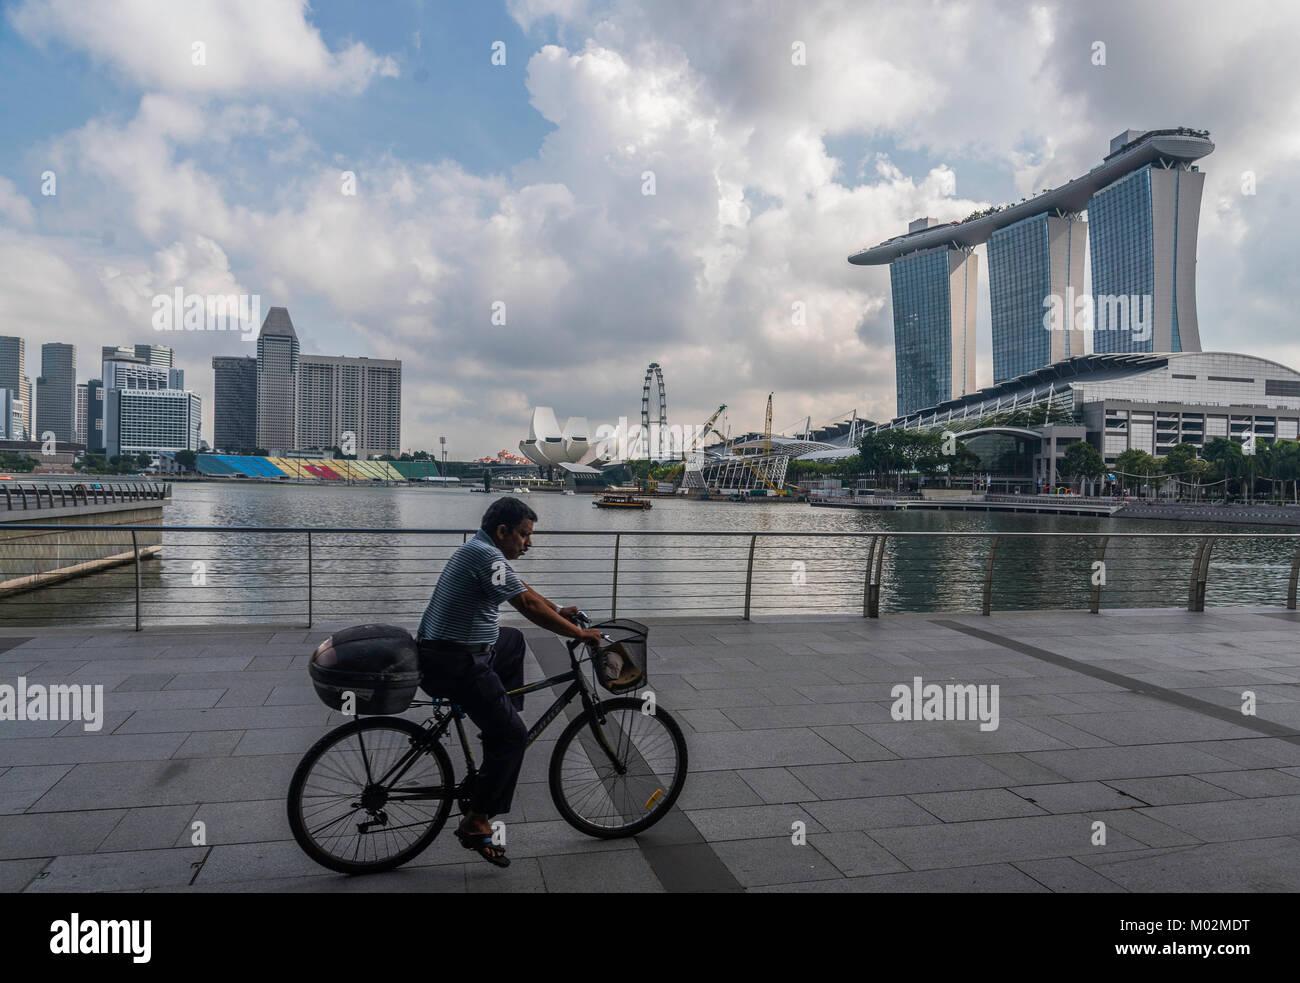 Architektur von Downton Kern, Marina Bay, Singapore Stockbild